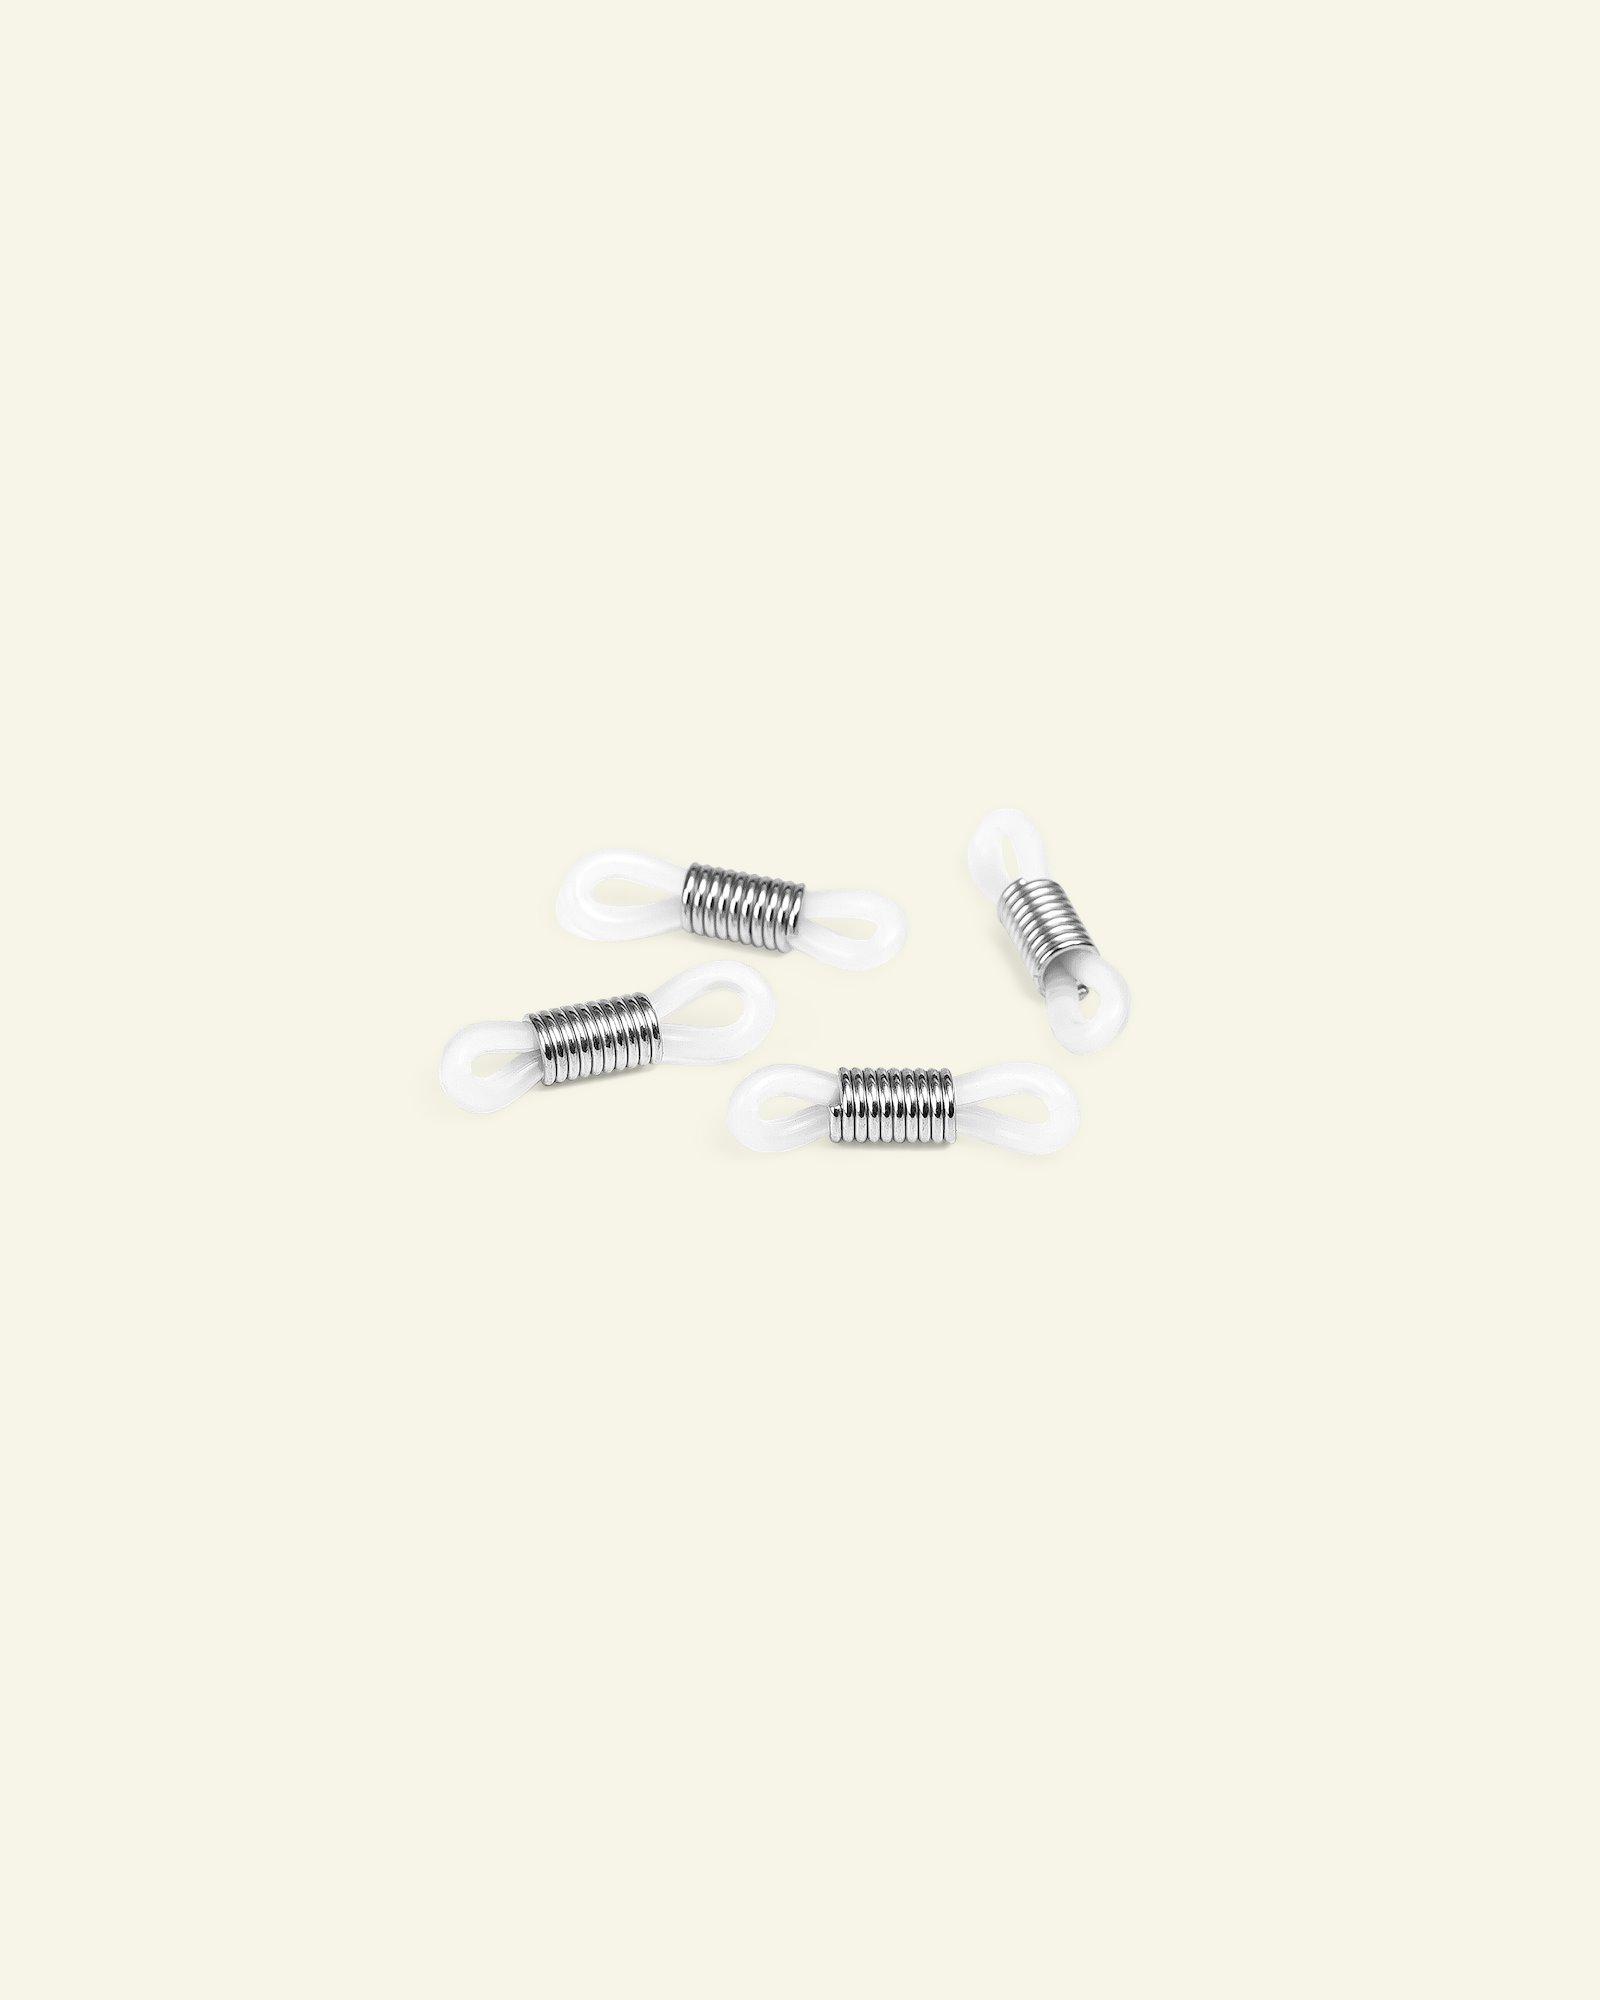 Brillenhalter Silikon 20mm Silb/Weiß,4St